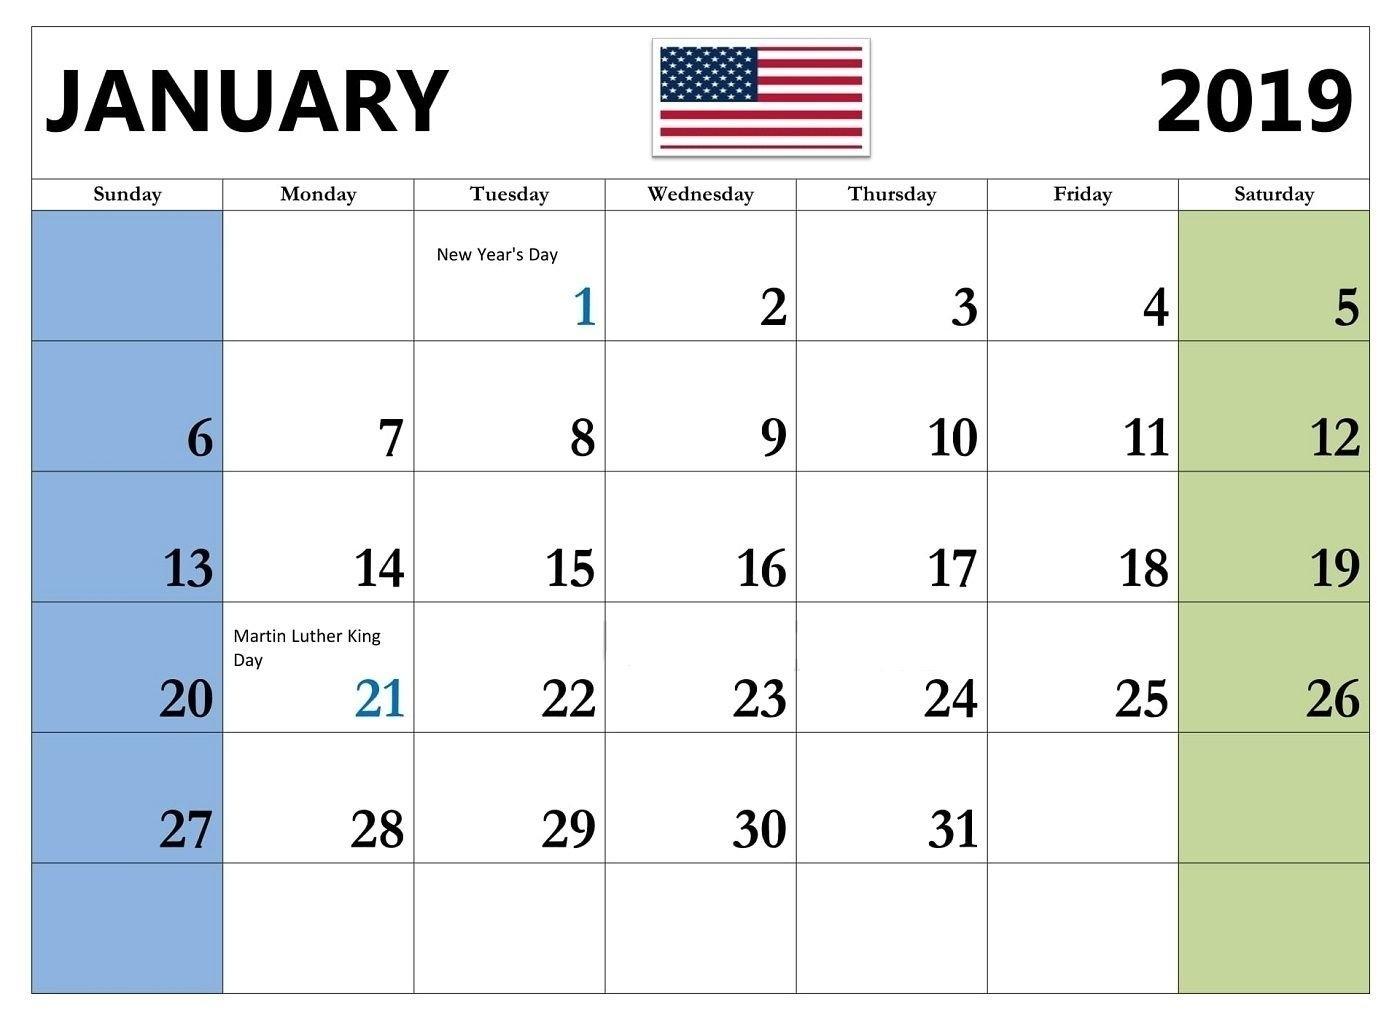 January 2019 Usa Holiday Calendar #january2019 #january2019Calendar Calendar 2019 Usa